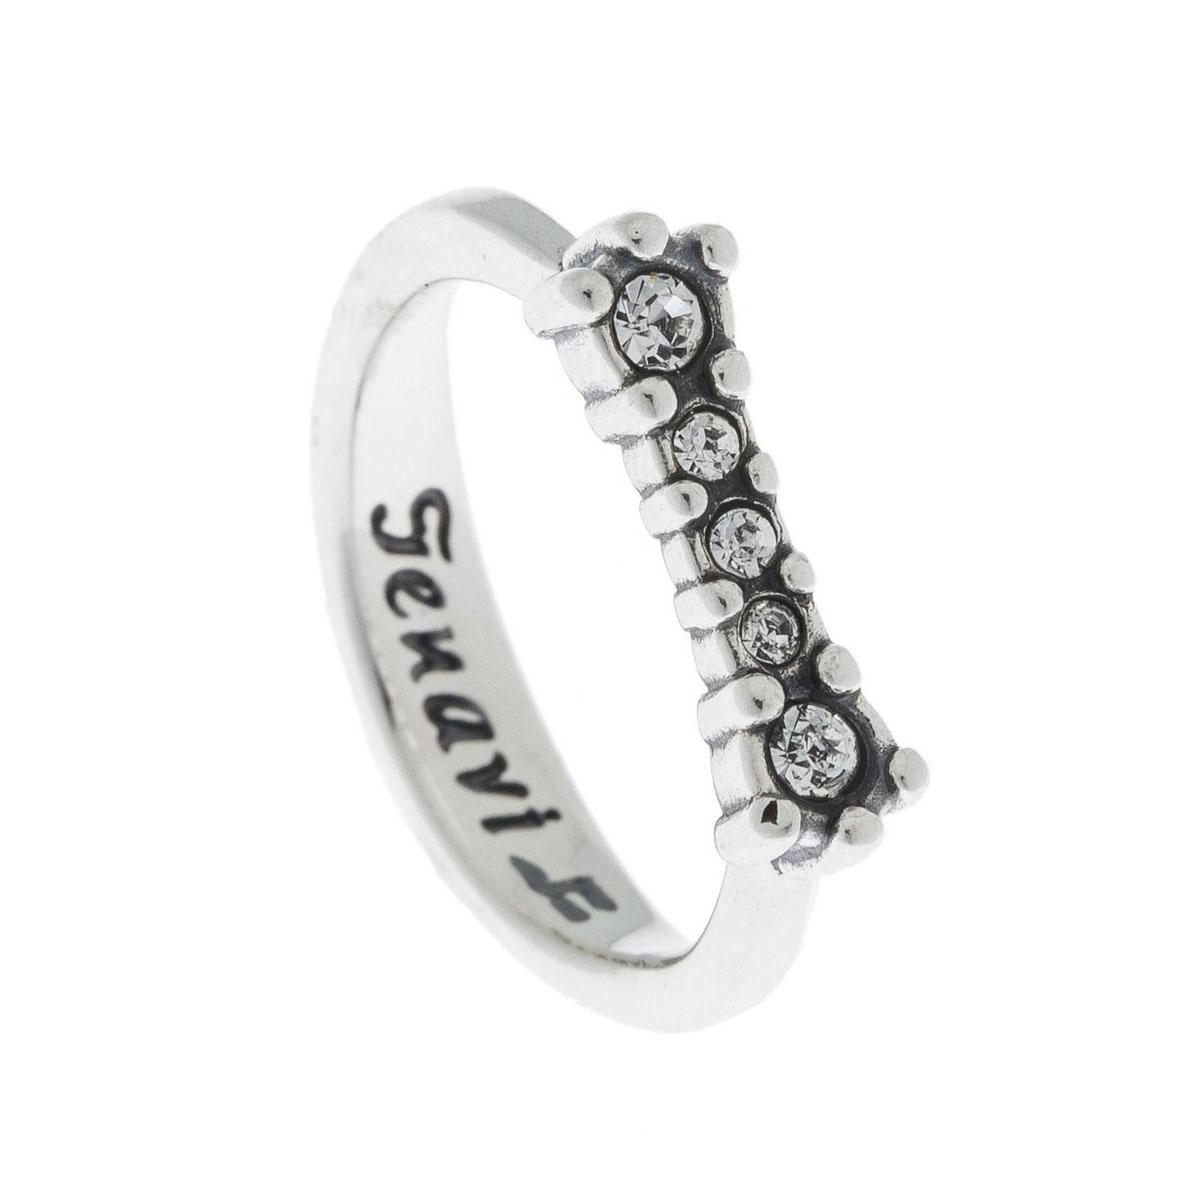 Кольцо Jenavi Эми, цвет: серебро, белый. k4973000. Размер 17k4973000Коллекция Э, Эми (Кольцо) гипоаллергенный ювелирный сплав,Черненое серебро, вставка Кристаллы Swarovski